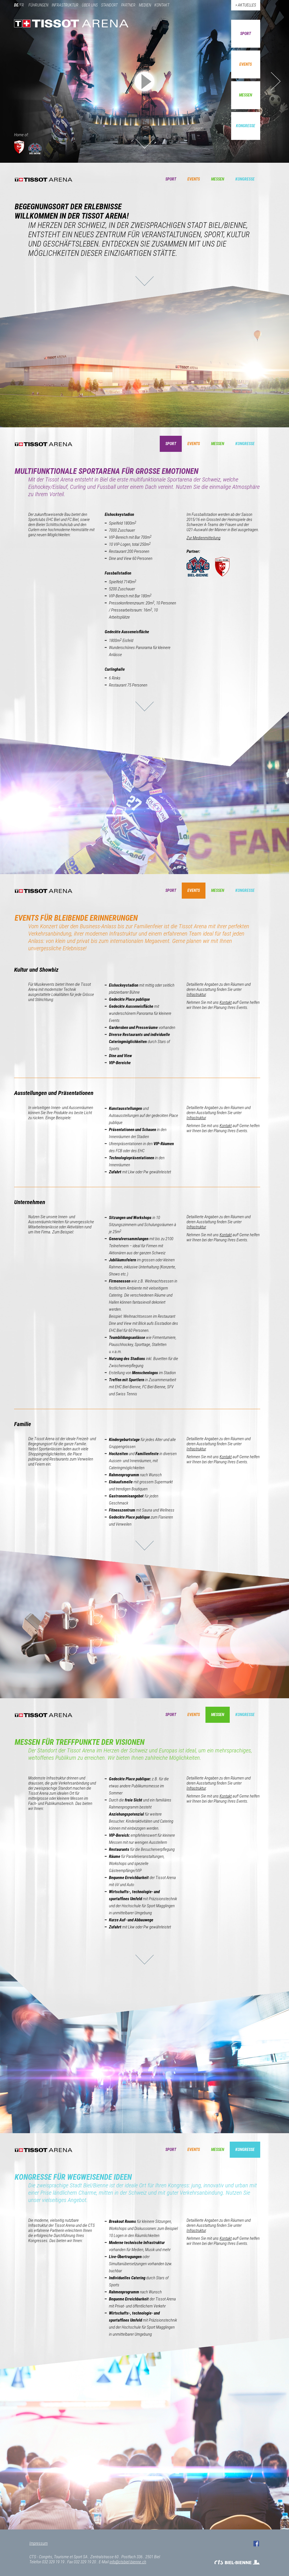 Nett Rahmen Zu Fuß Fotos - Rahmen Ideen - markjohnsonshow.info